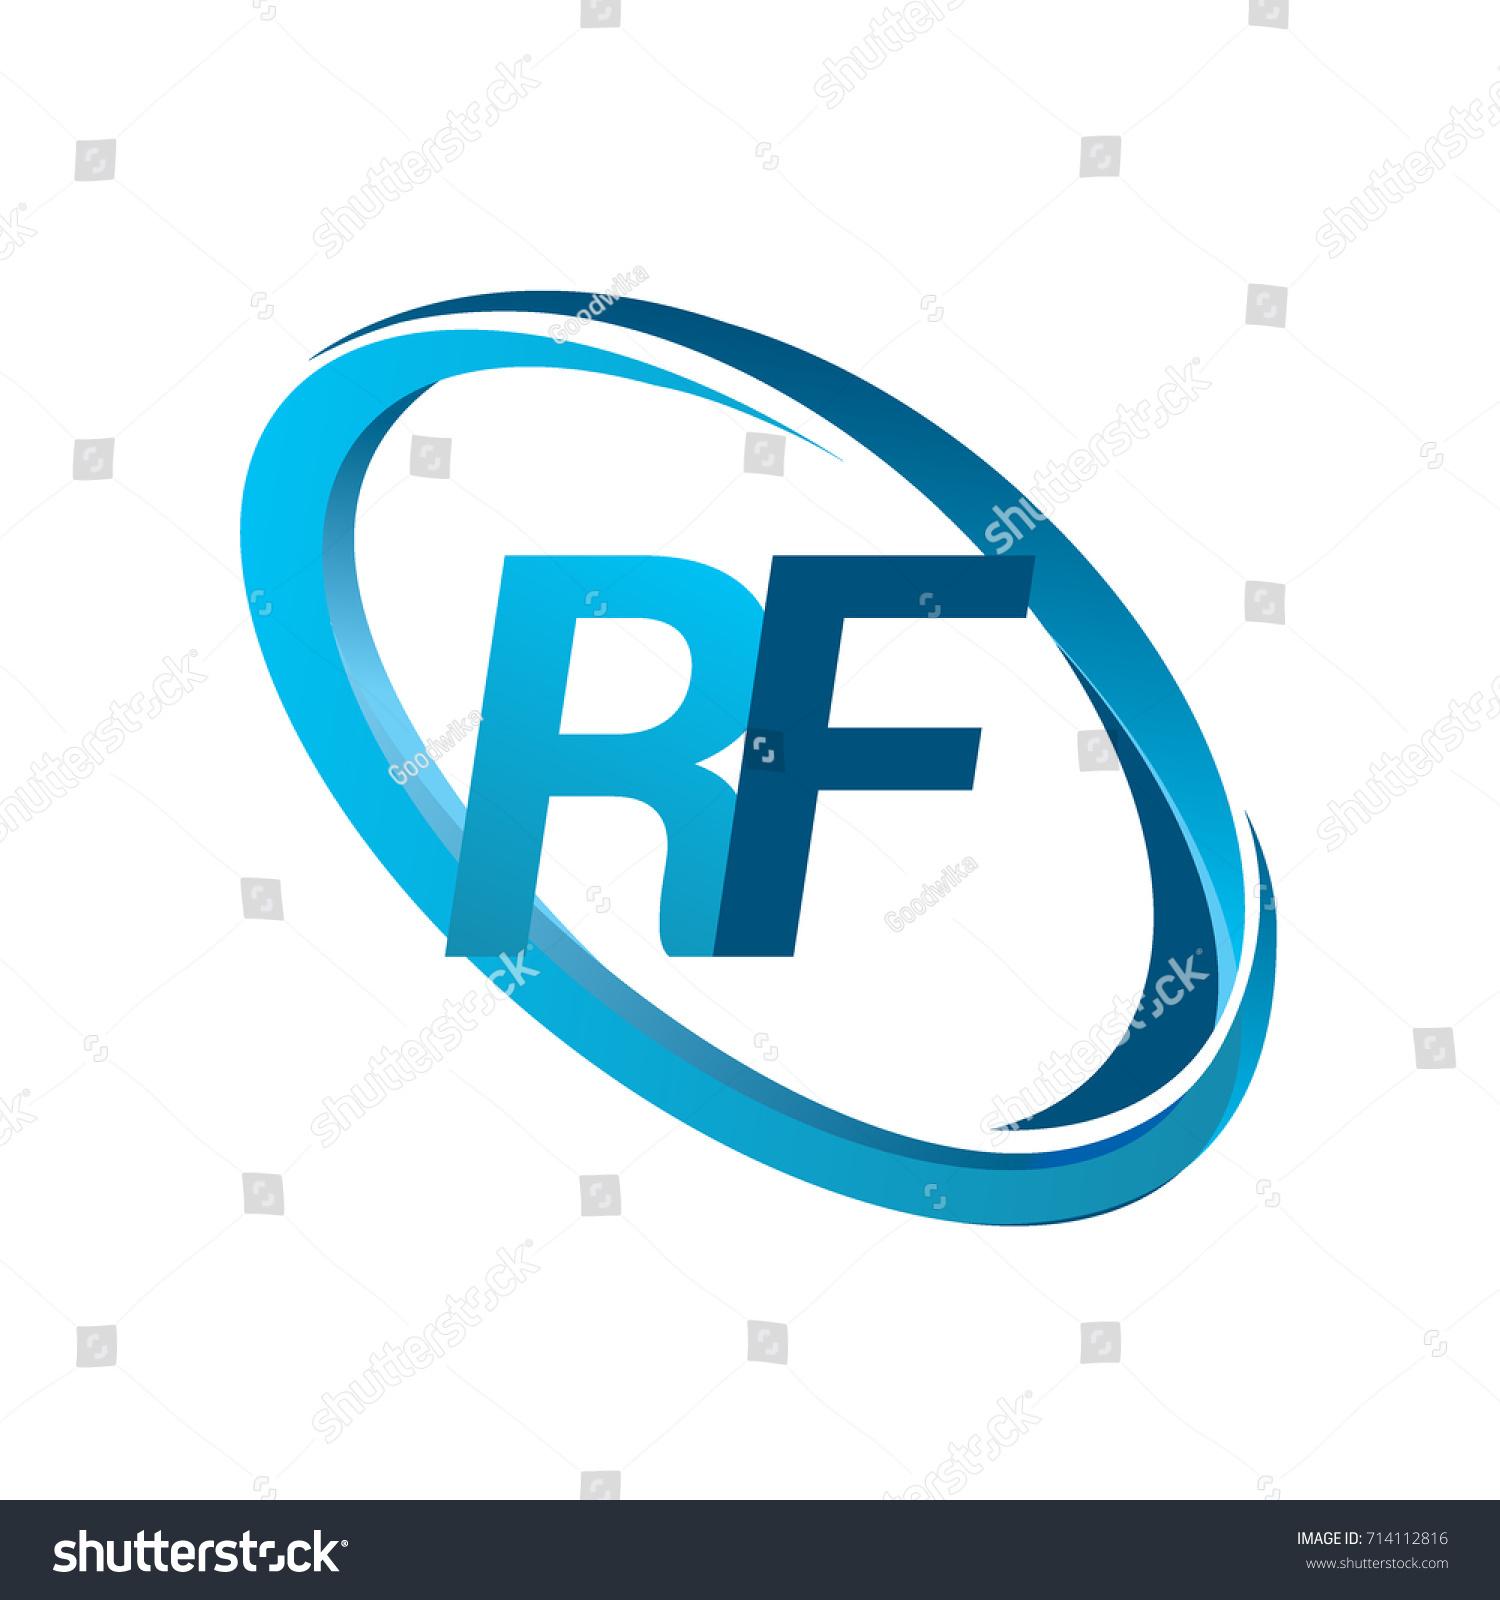 Letter rf logotype design company name stock vector 714112816 letter rf logotype design company name stock vector 714112816 shutterstock buycottarizona